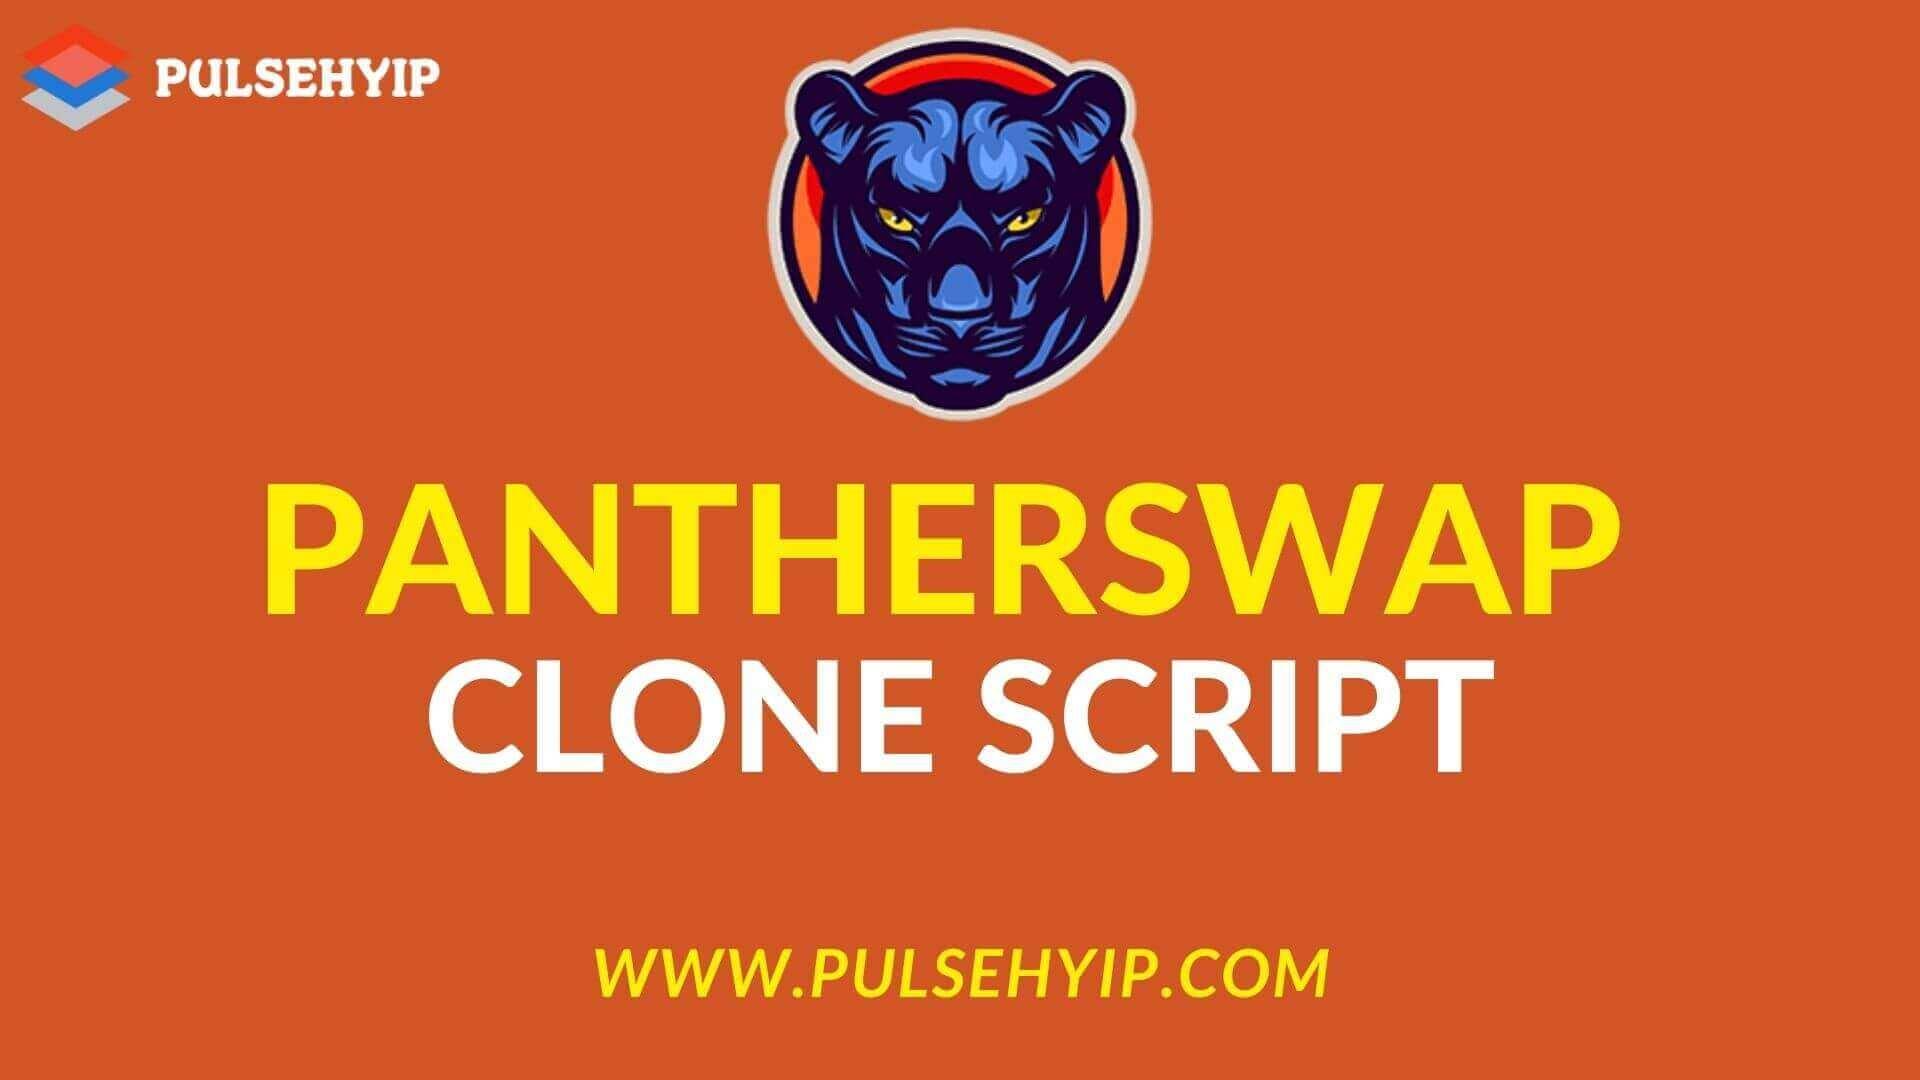 PantherSwap Clone Script - To Launch DeFi DEX like Pantherswap on Binance Smart Chain